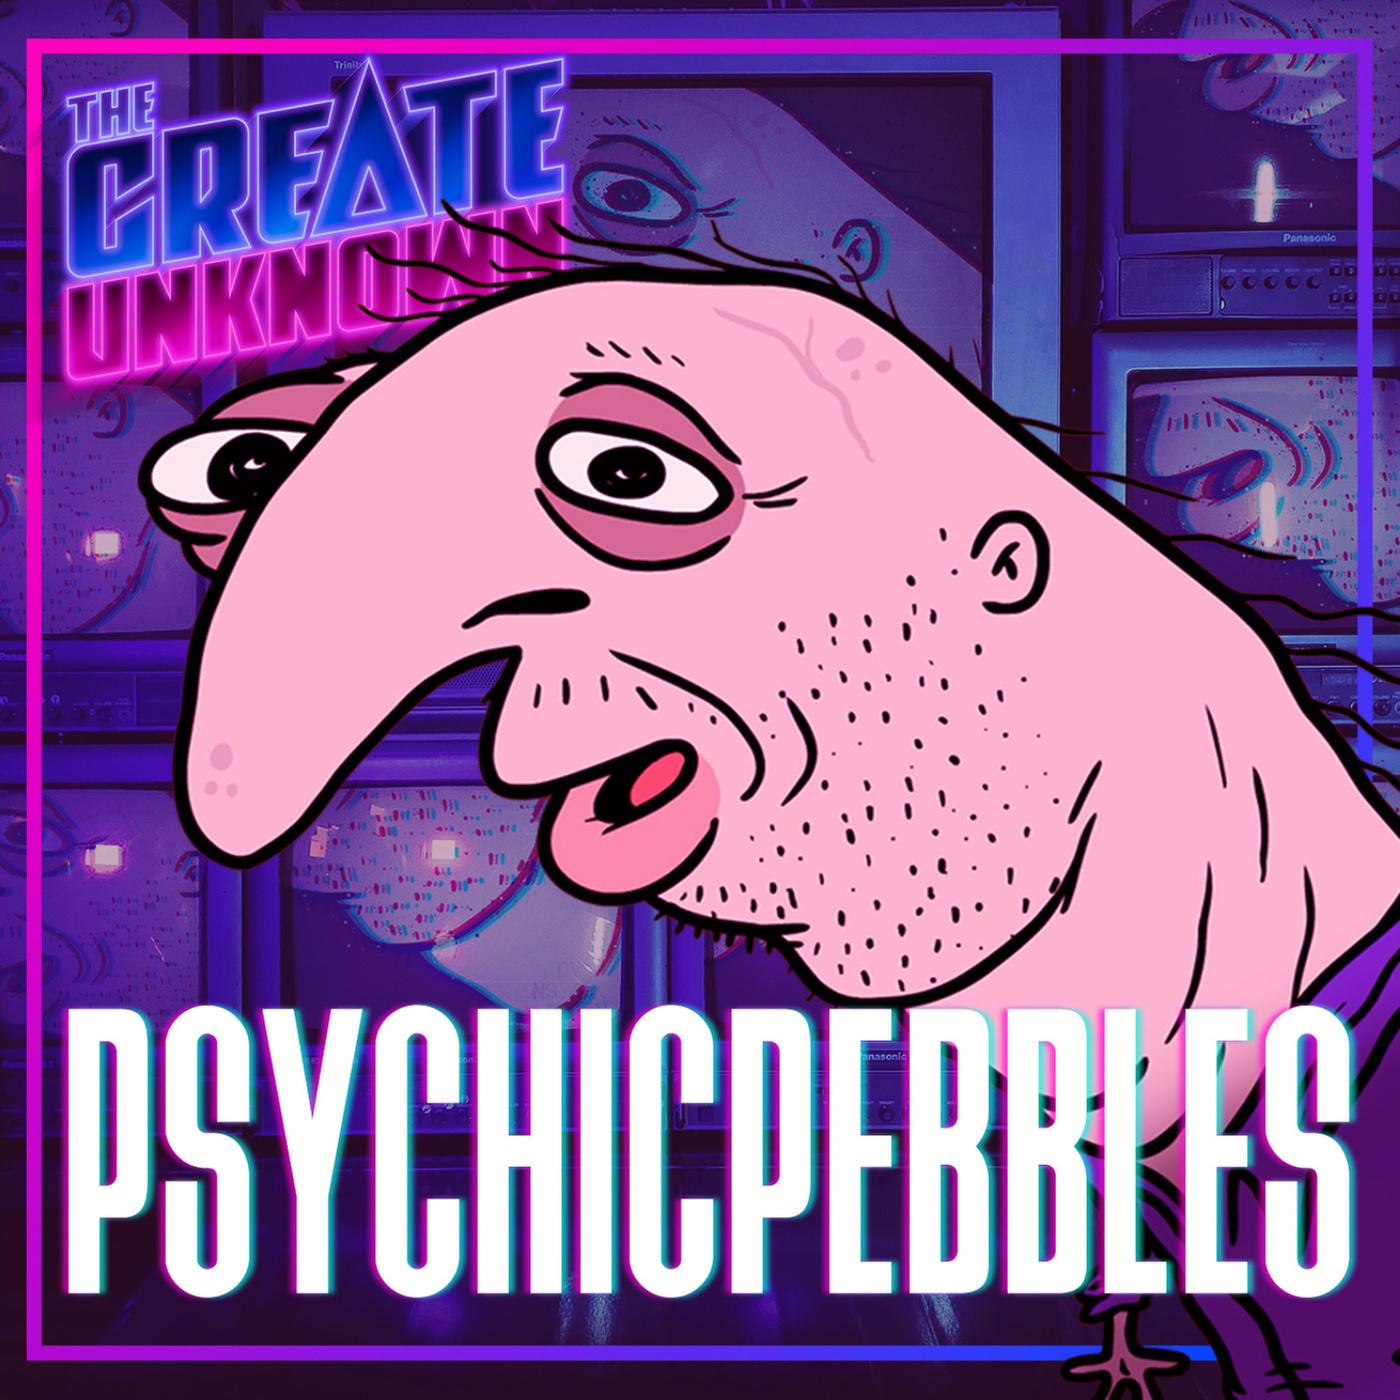 PyschicPebbles: YouTube's Very Positive (and Least Monetized) Animator